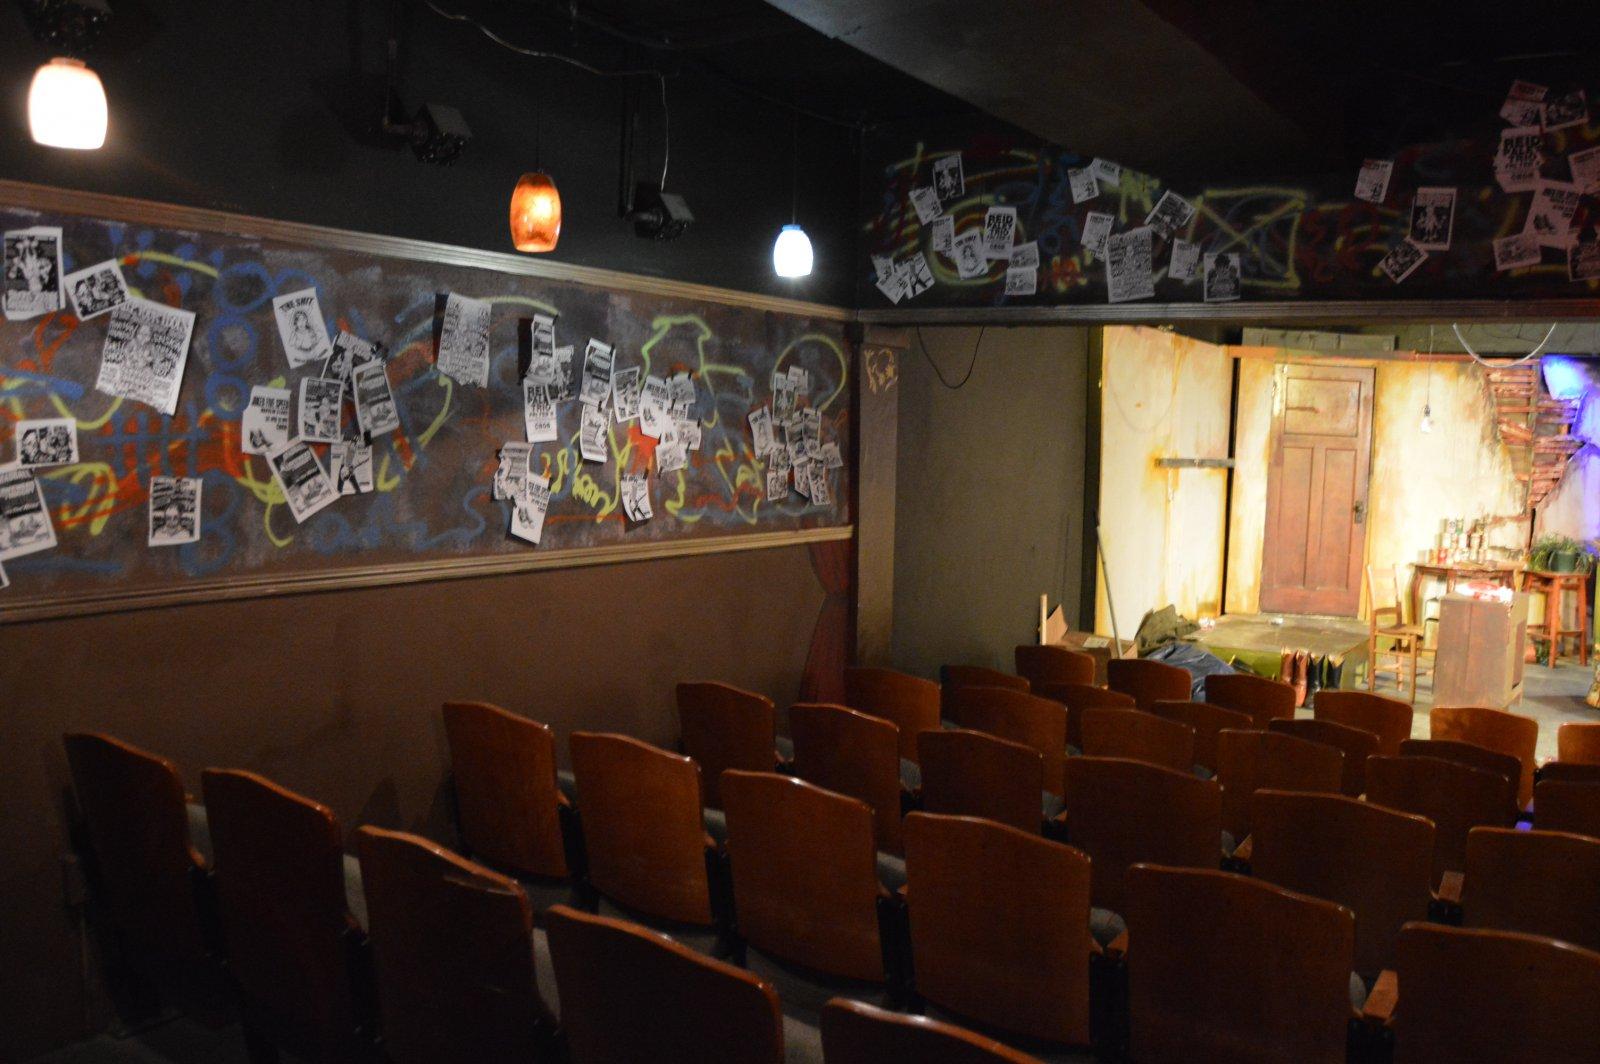 Inside the Alchemist Theatre